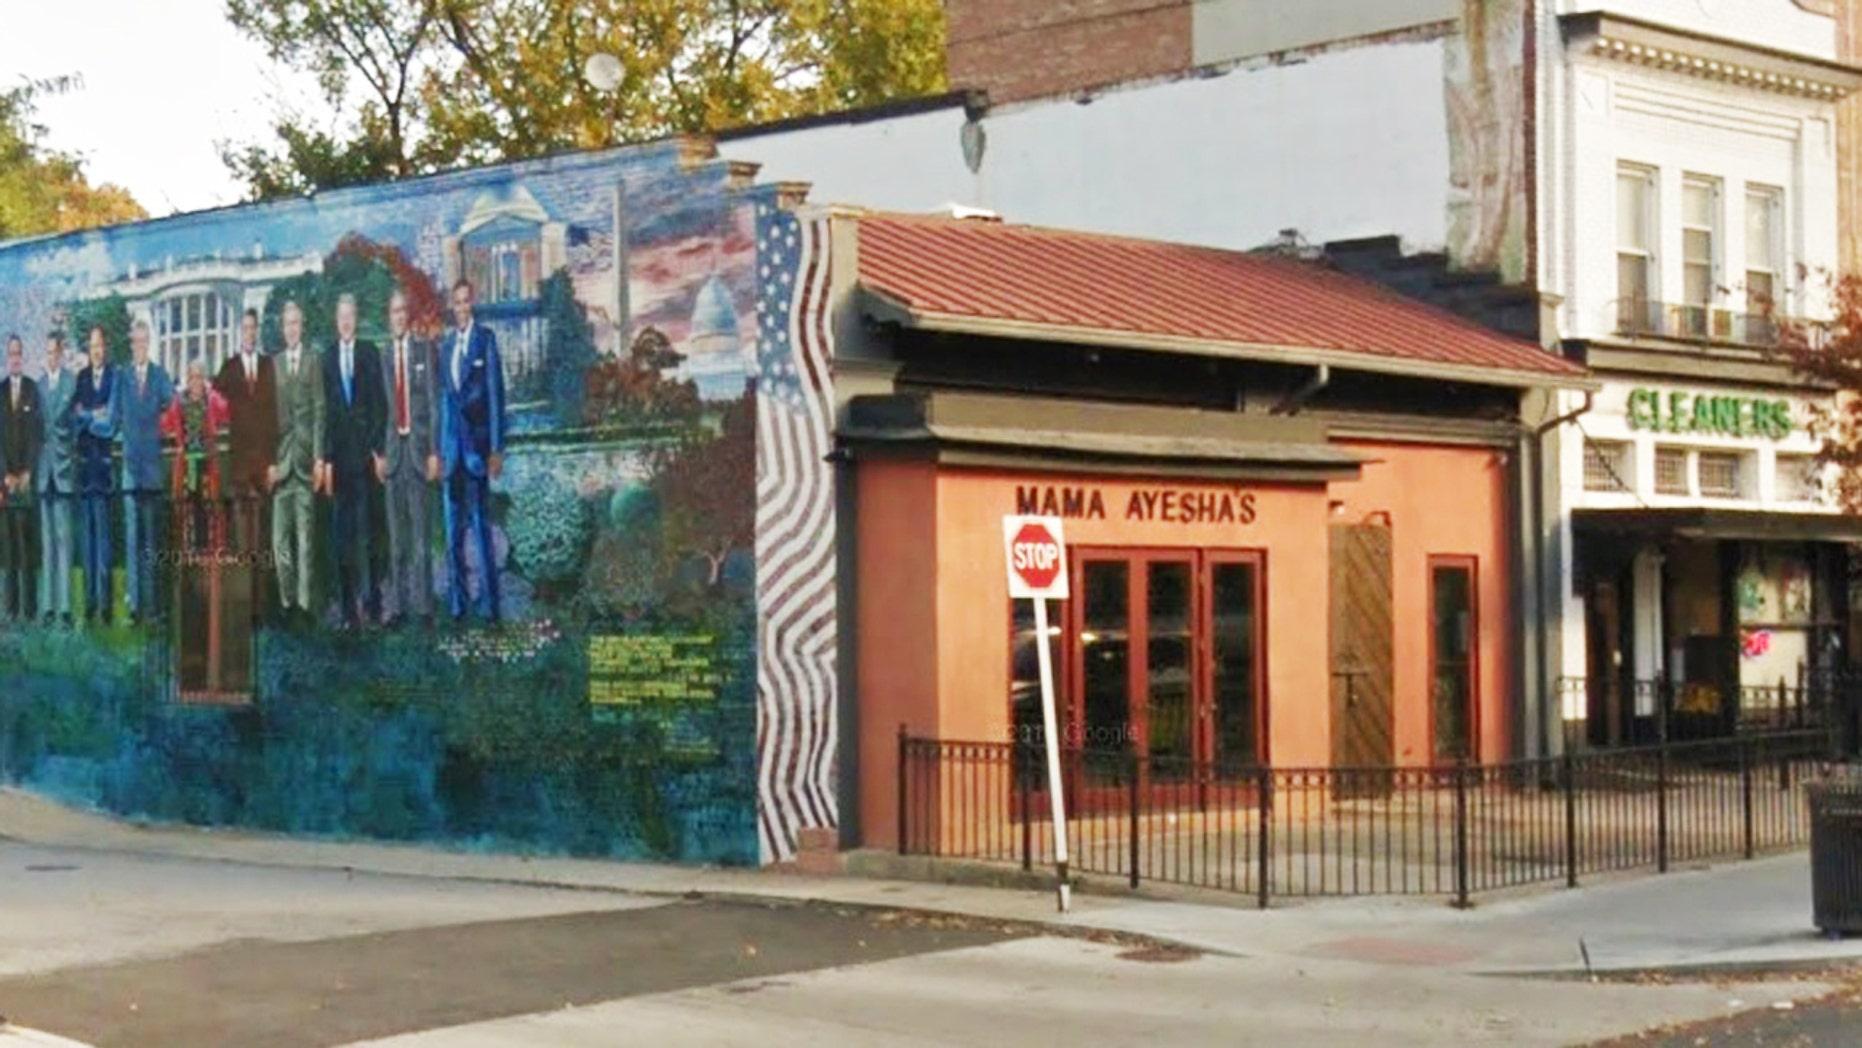 Mama Ayesha's restaurant in D.C.'s trendy Adams Morgan neighborhood serves Middle Eastern cuisine.